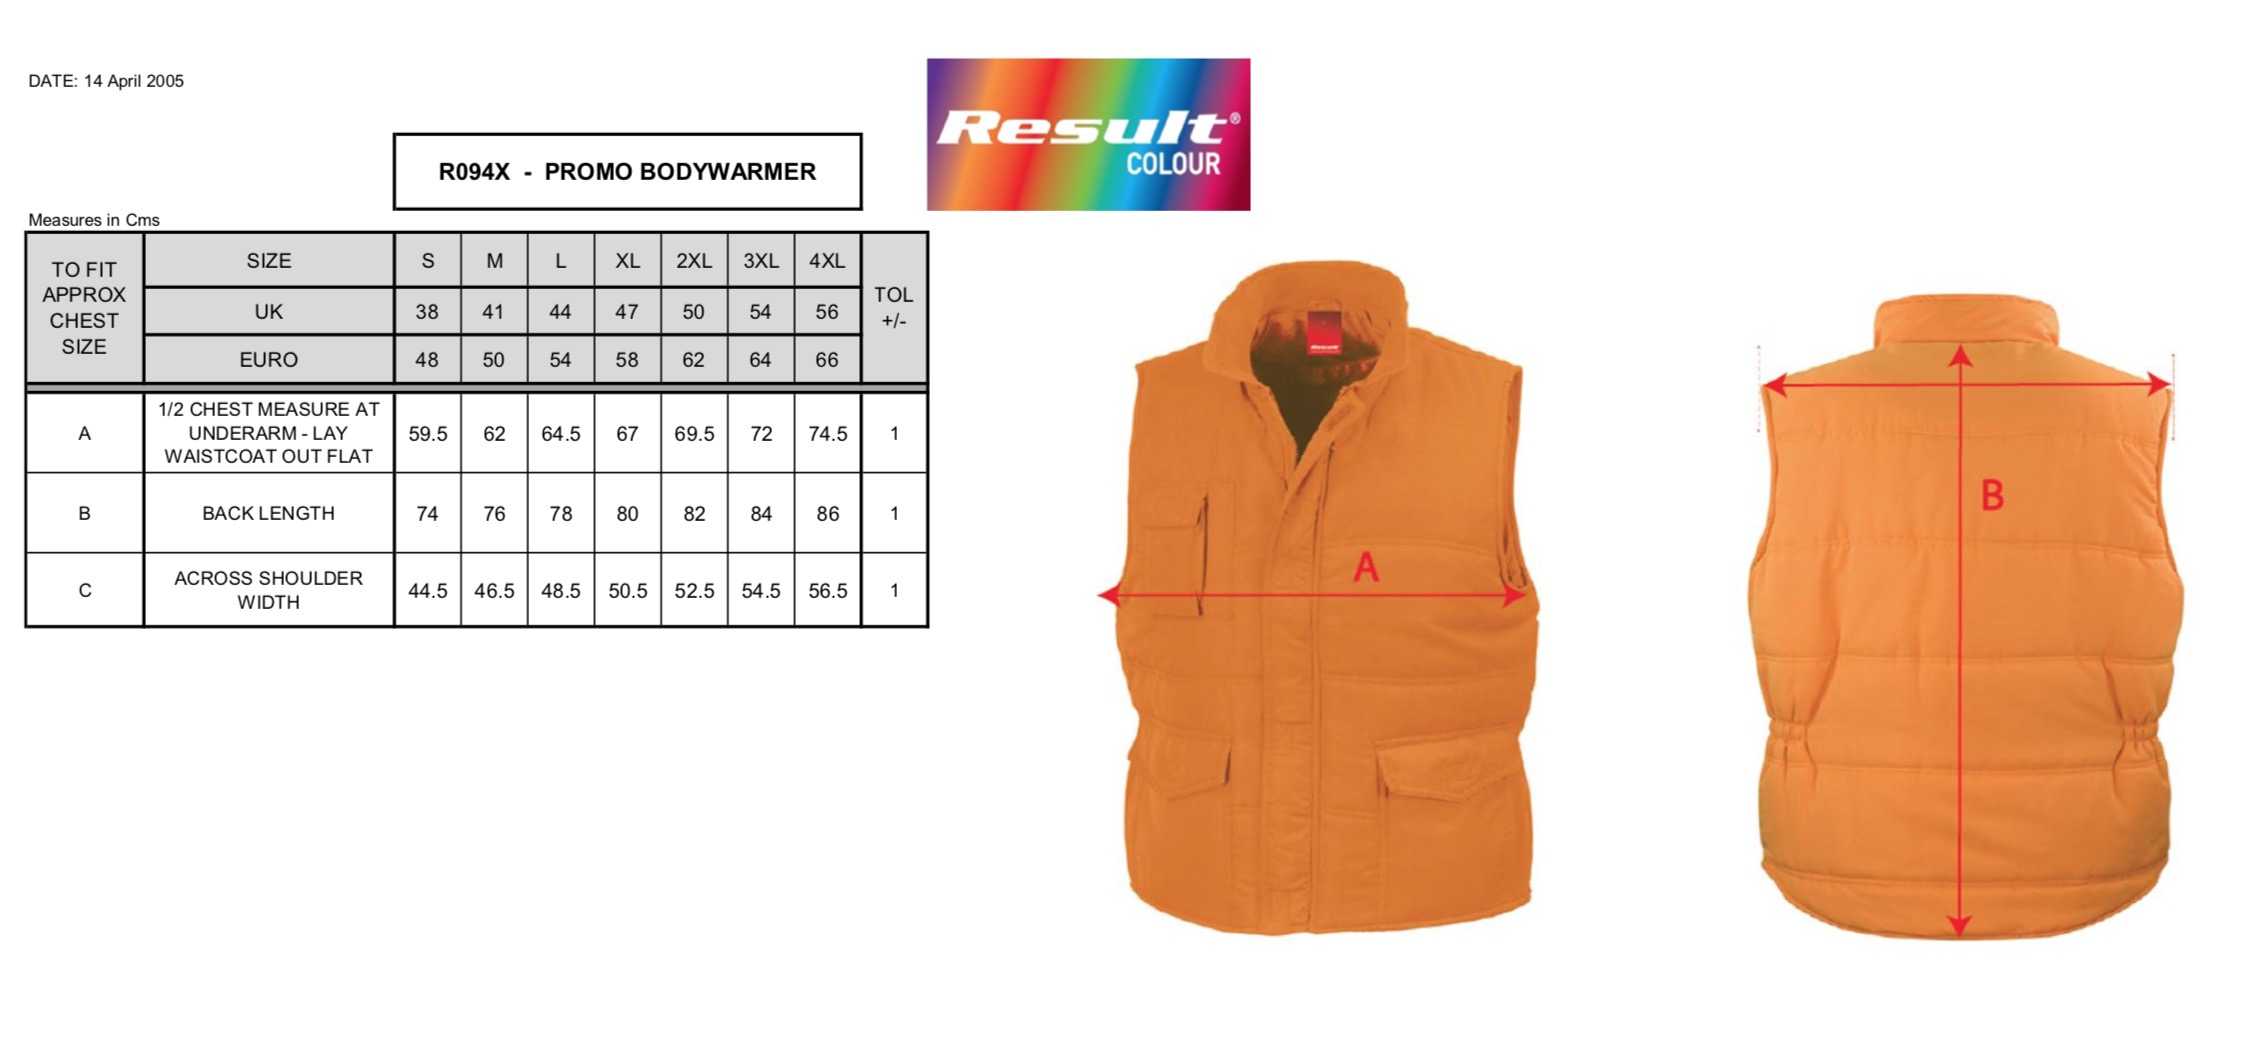 Result: Promo Bodywarmer R094X